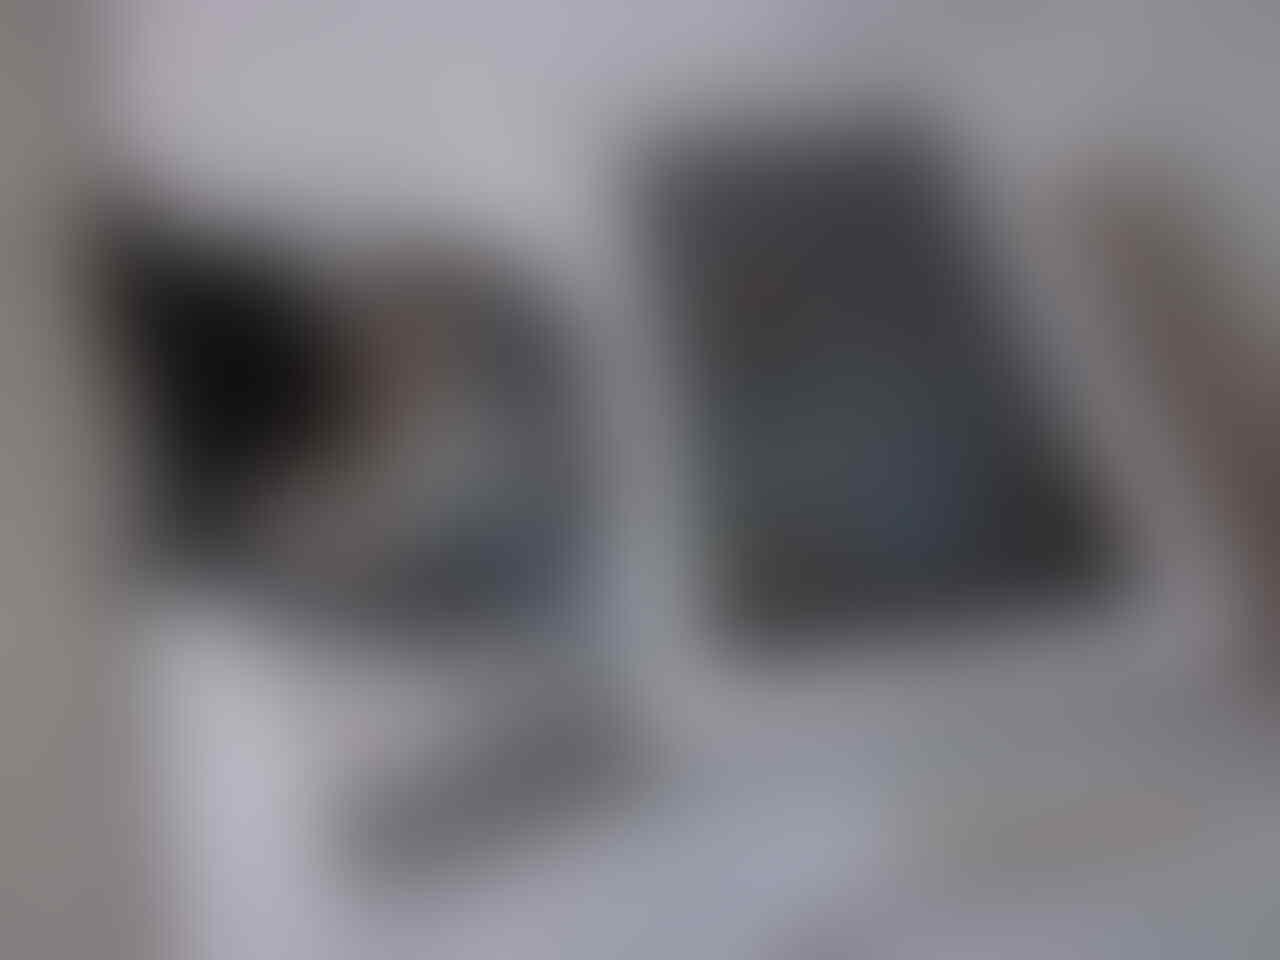 SAMSUNG GALAXY TAB 2 7.0 & IPHONE 3GS 32GB